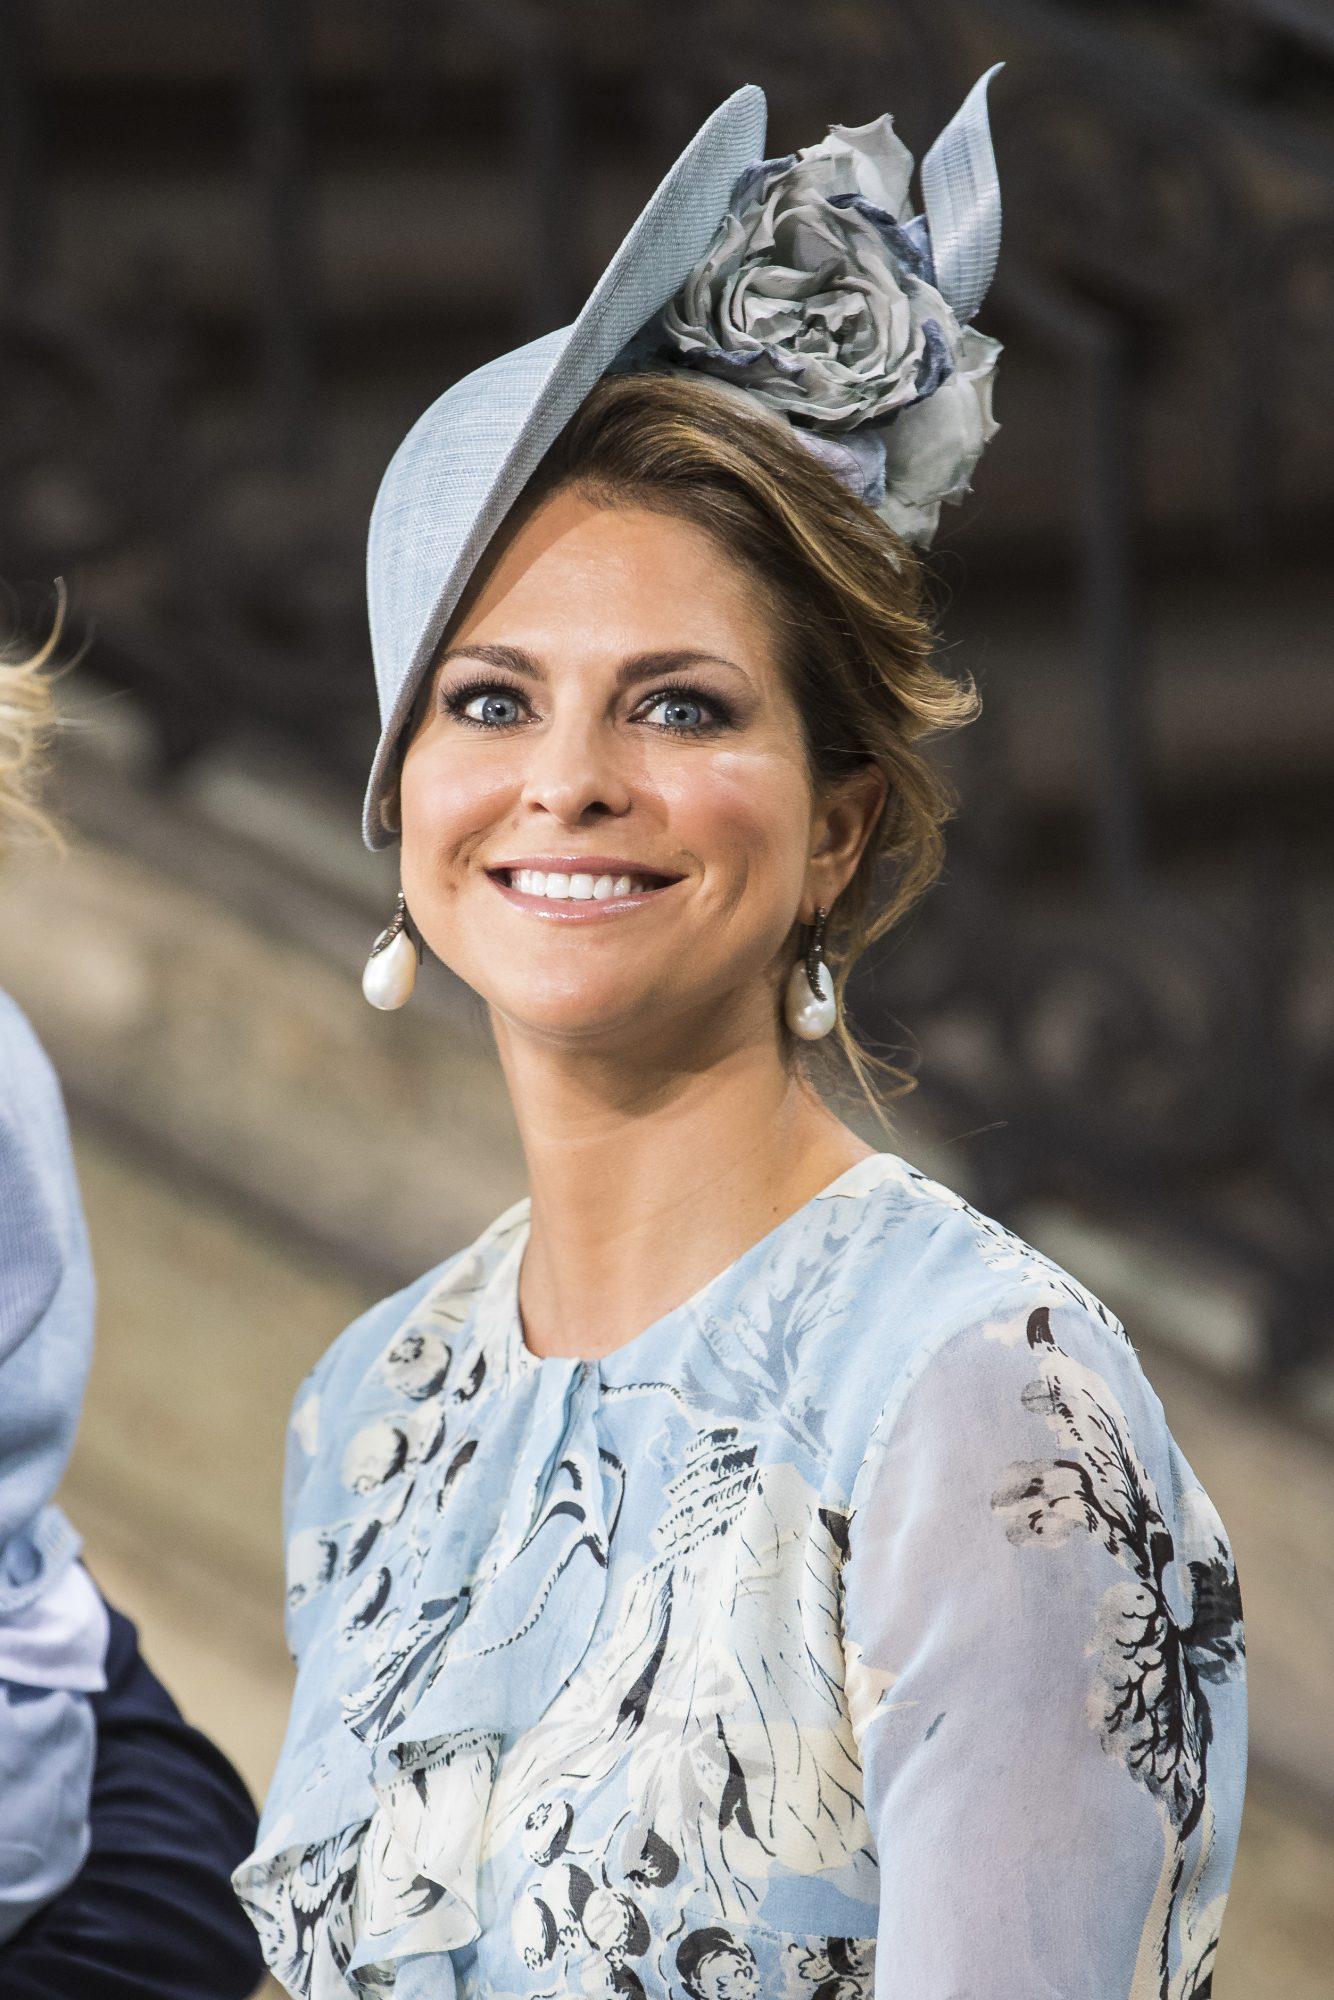 Princesa Madeleine de suecia, fascinator, sombrero, boda real